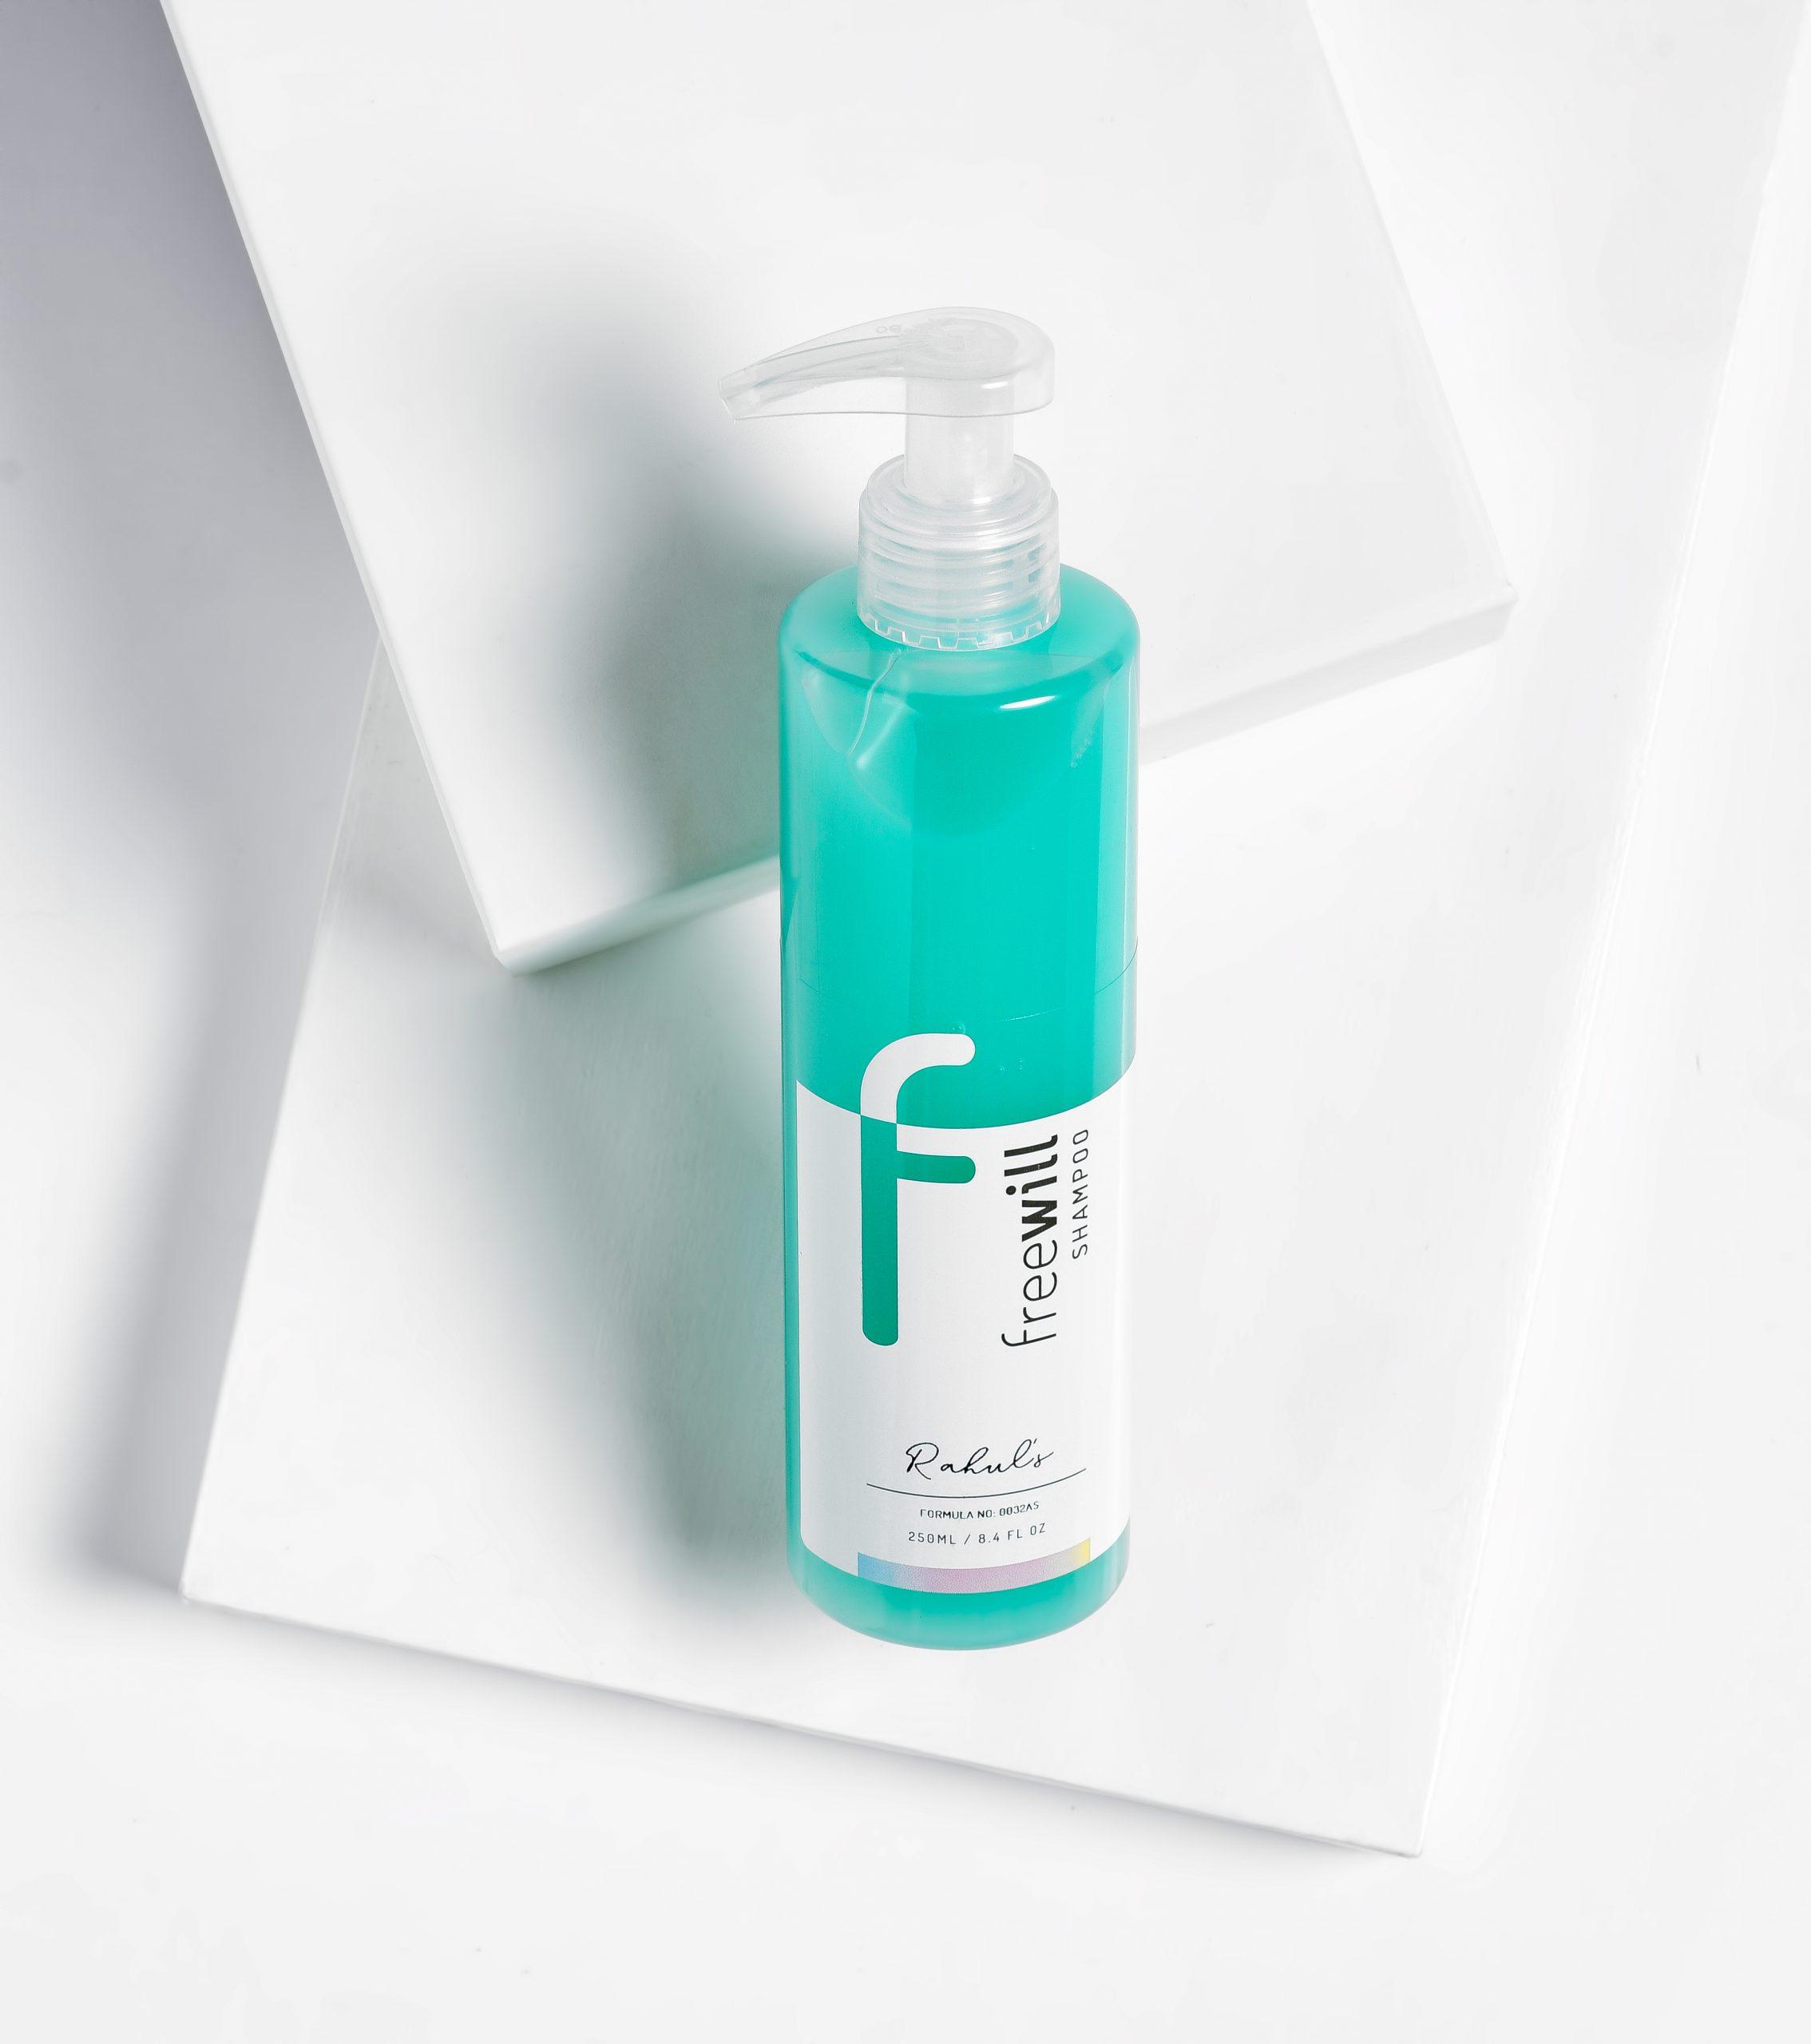 Shampoo from Freewill